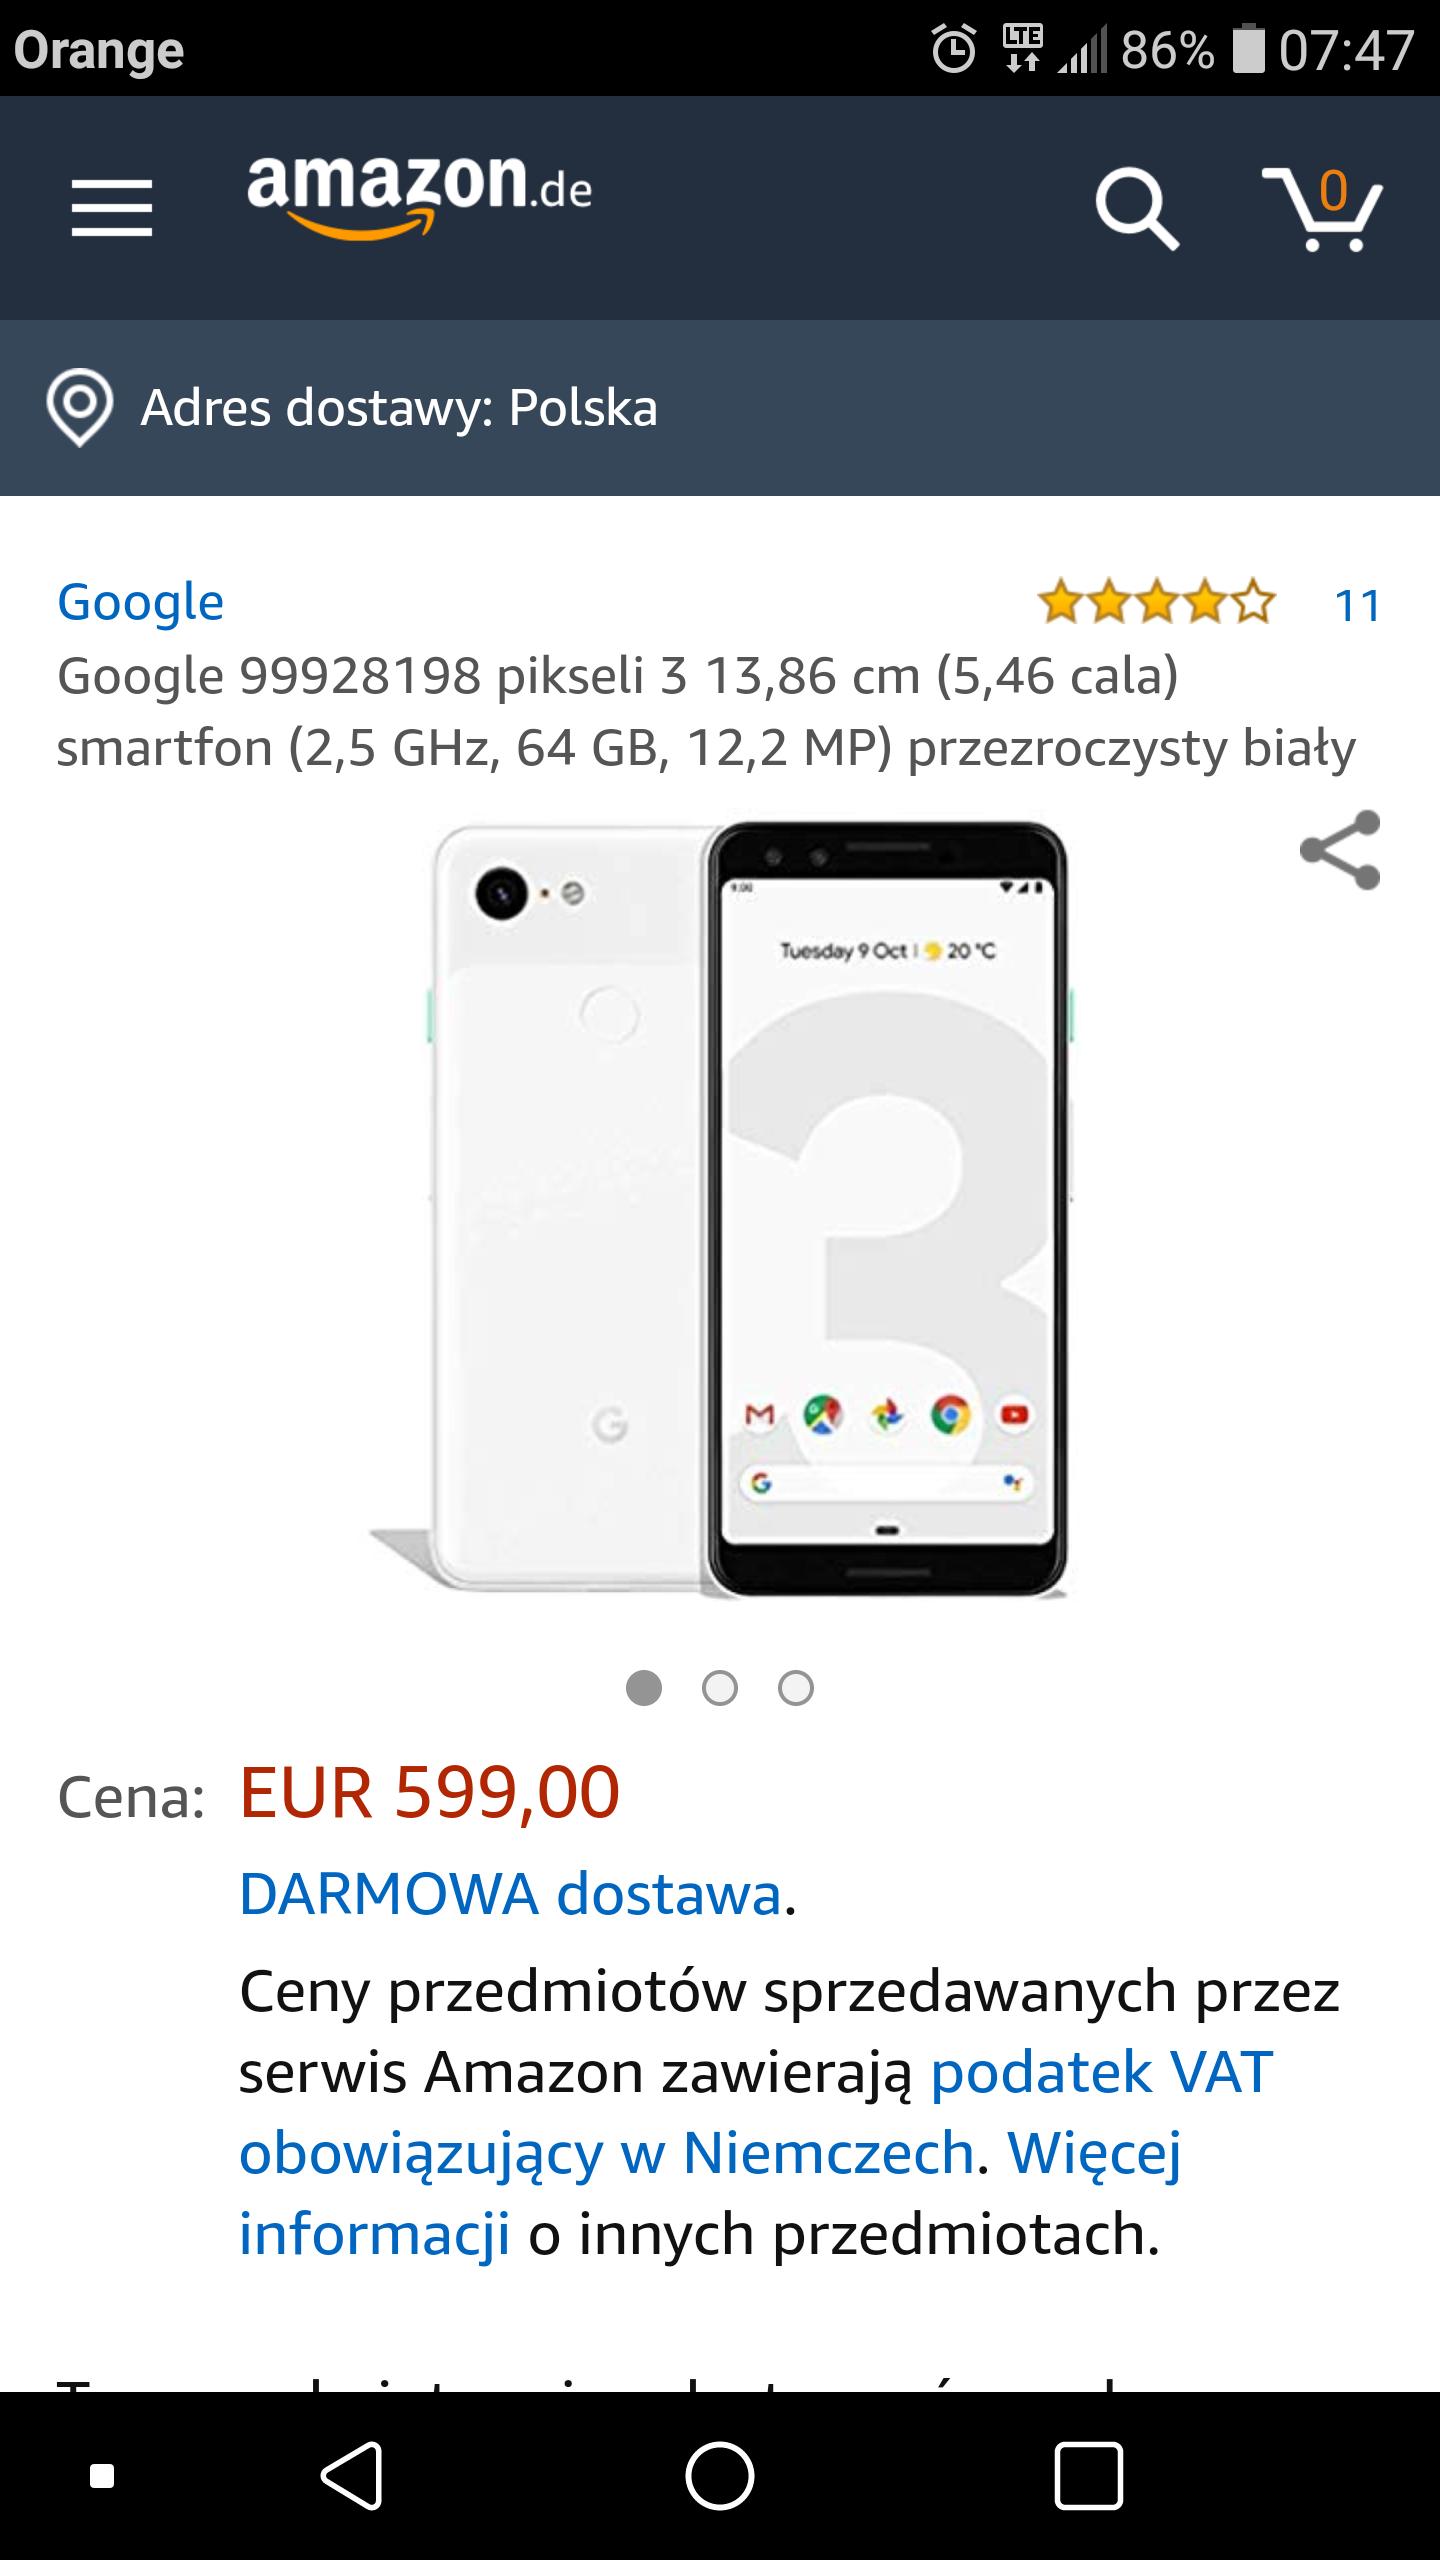 Google Pixel 3 white